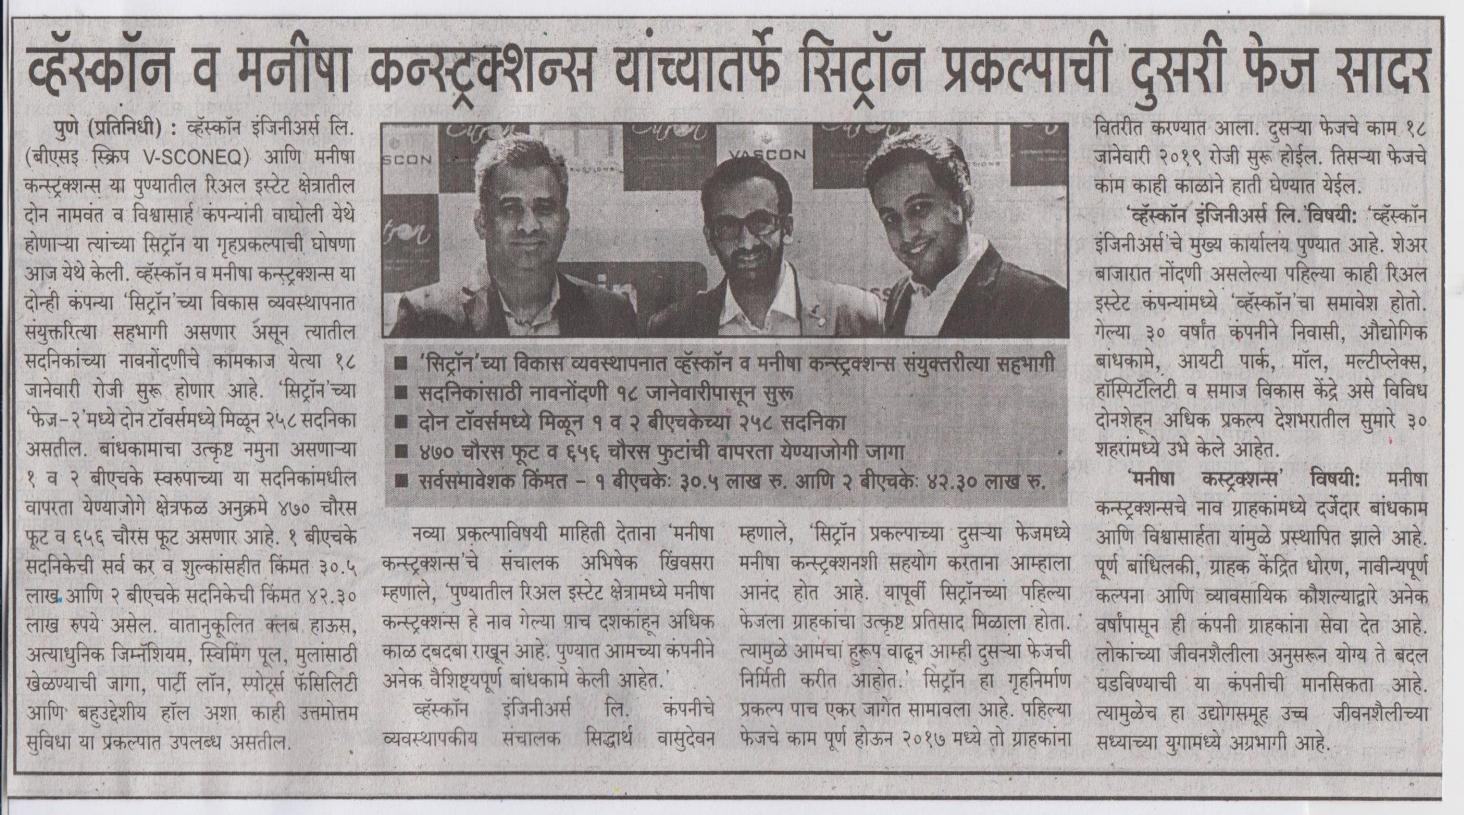 Vascon and Manisha Constructions' launches Citron Phase II (Lokmanya Sanjvarta)